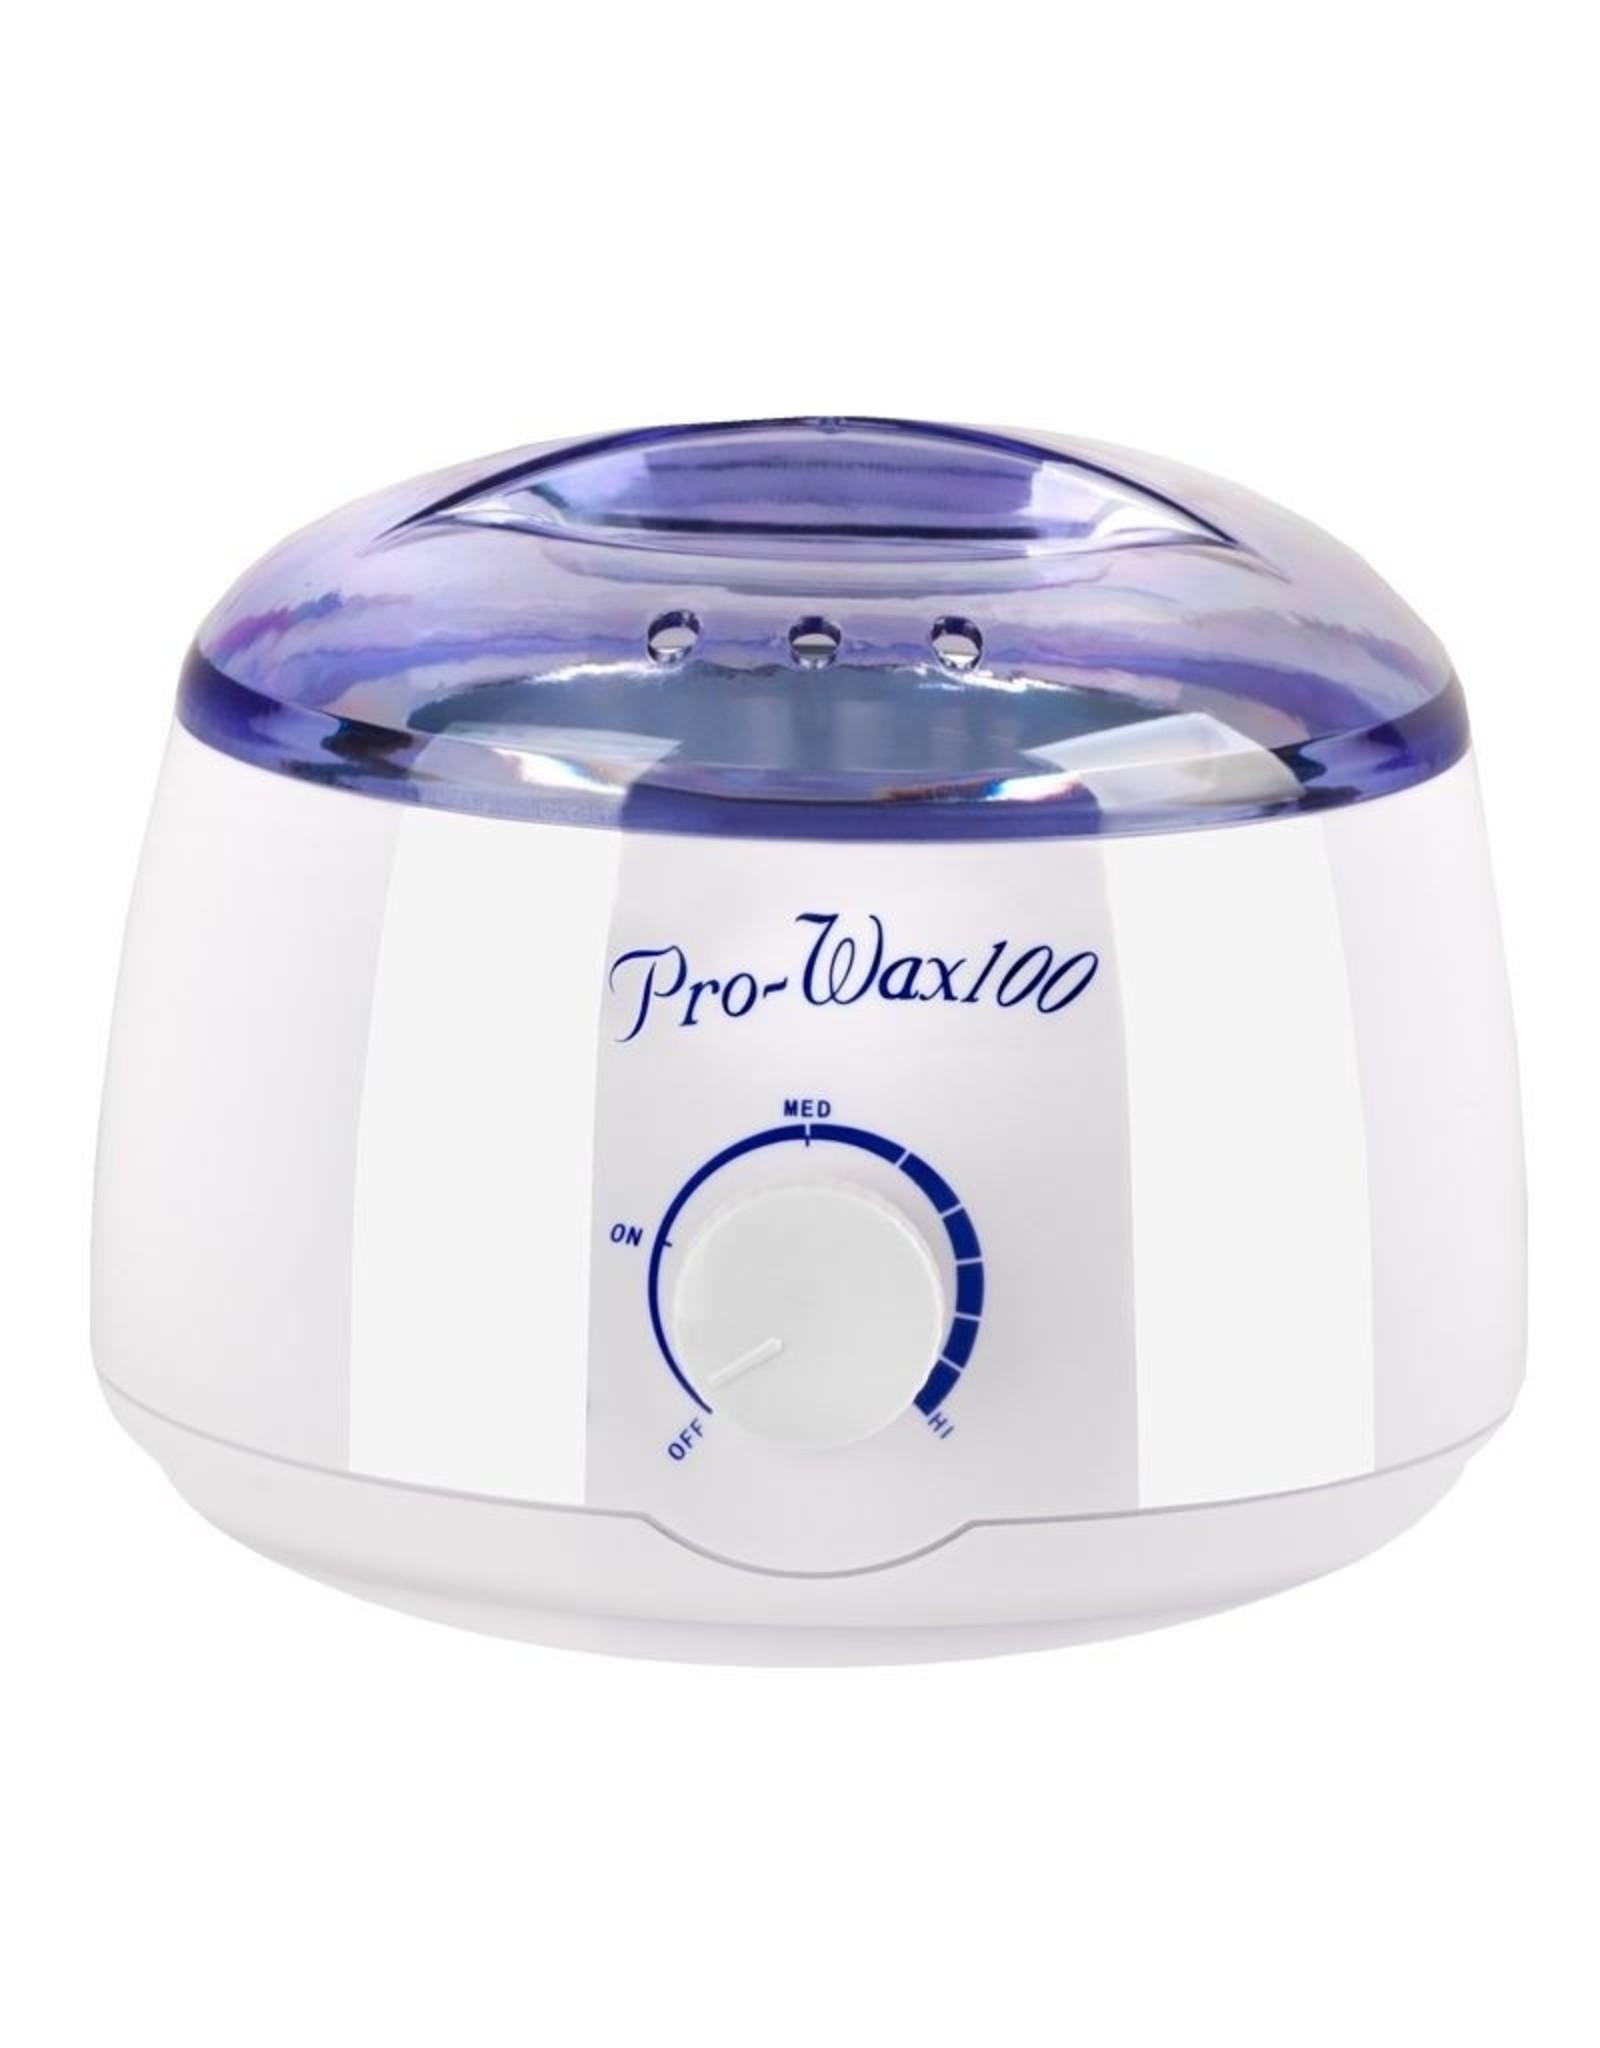 Merkloos Waxapparaat Pro Wax 100 starterset 7. Wit